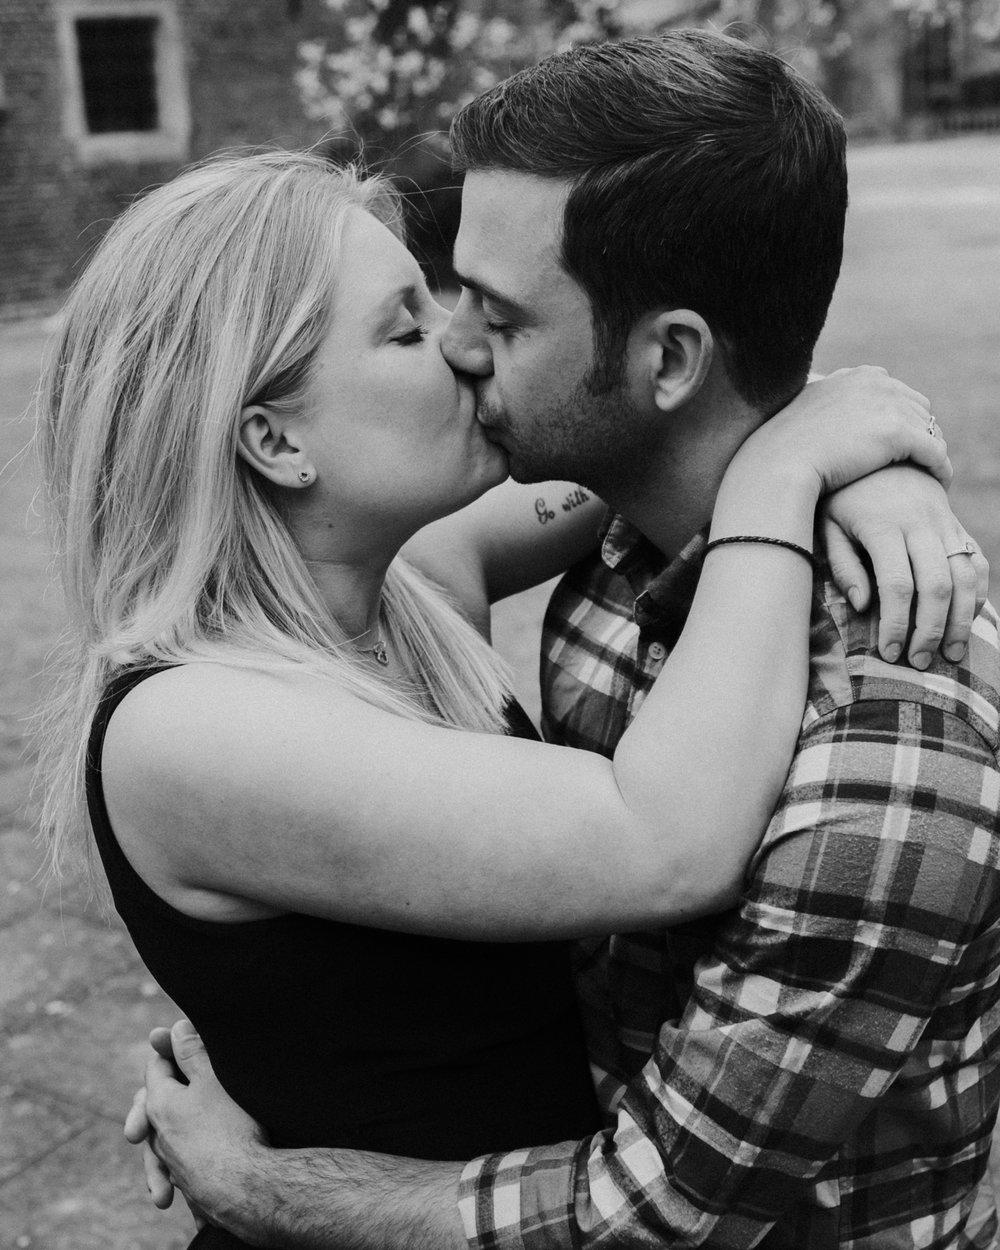 Engagement 2017 - 2018 (2 of 2)-2.jpg